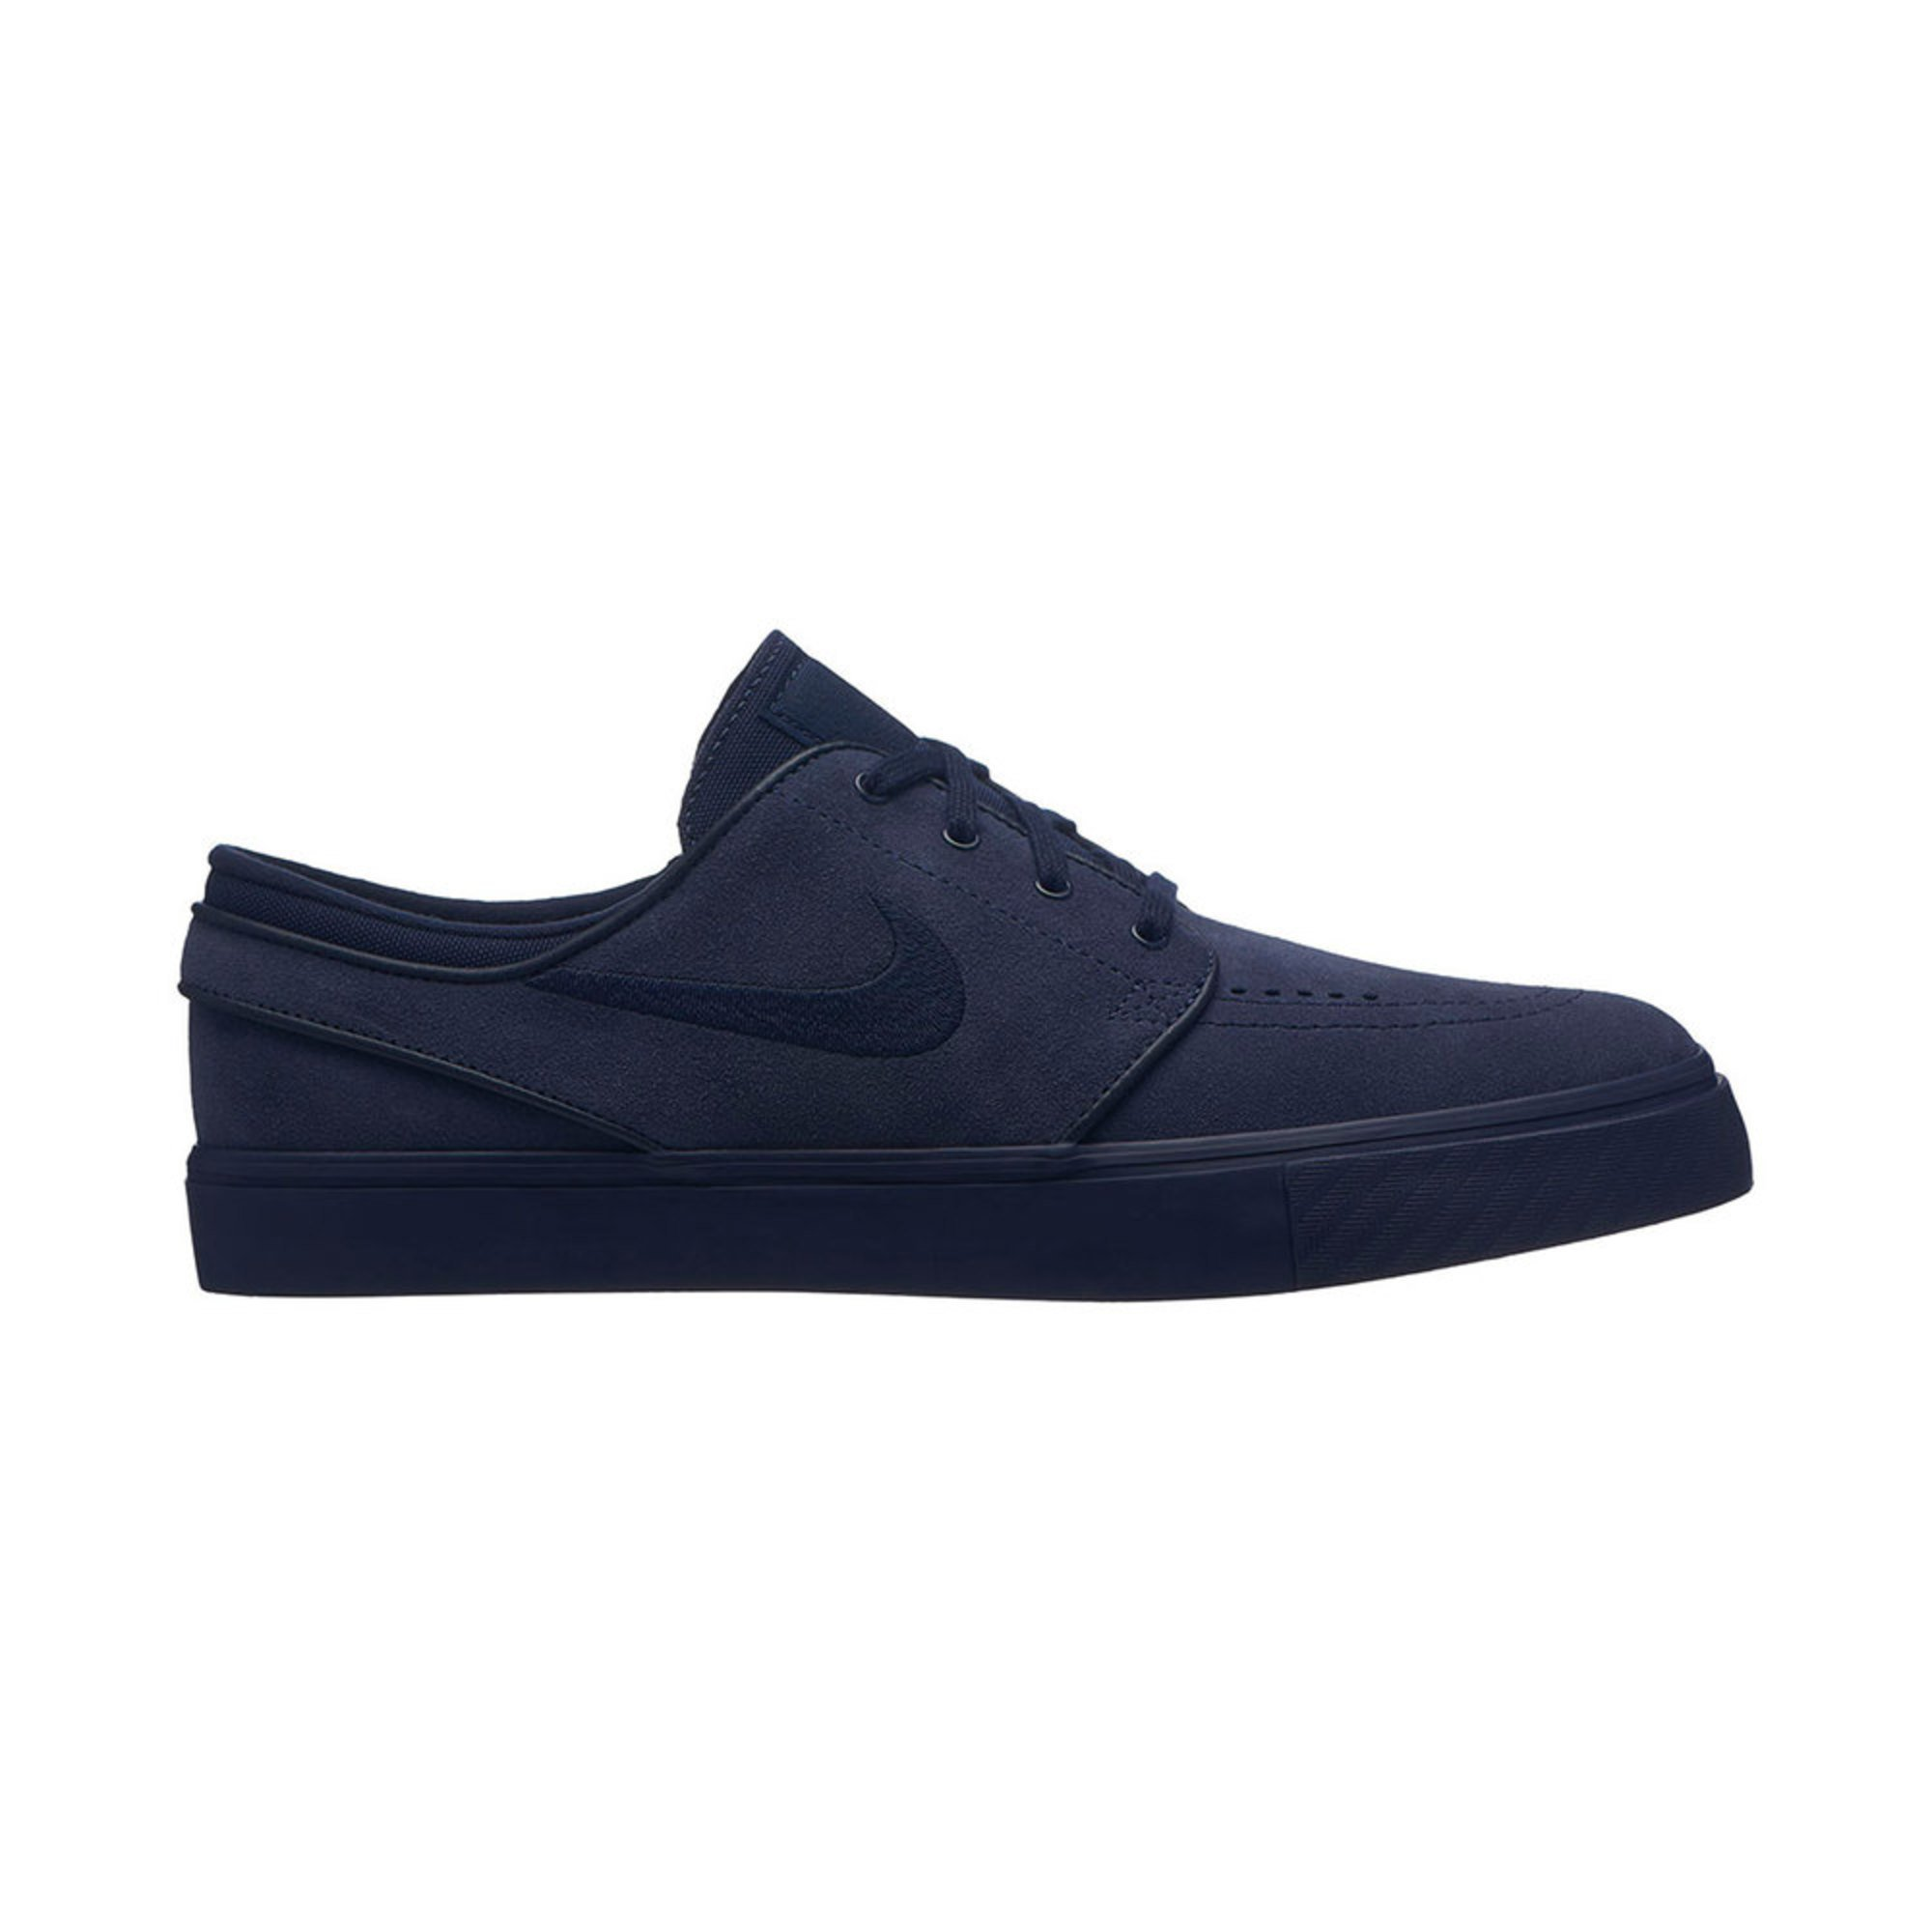 3d09abc88fc8 Nike Sb Men s Zoom Stefan Janoski Canvas Skate Shoe